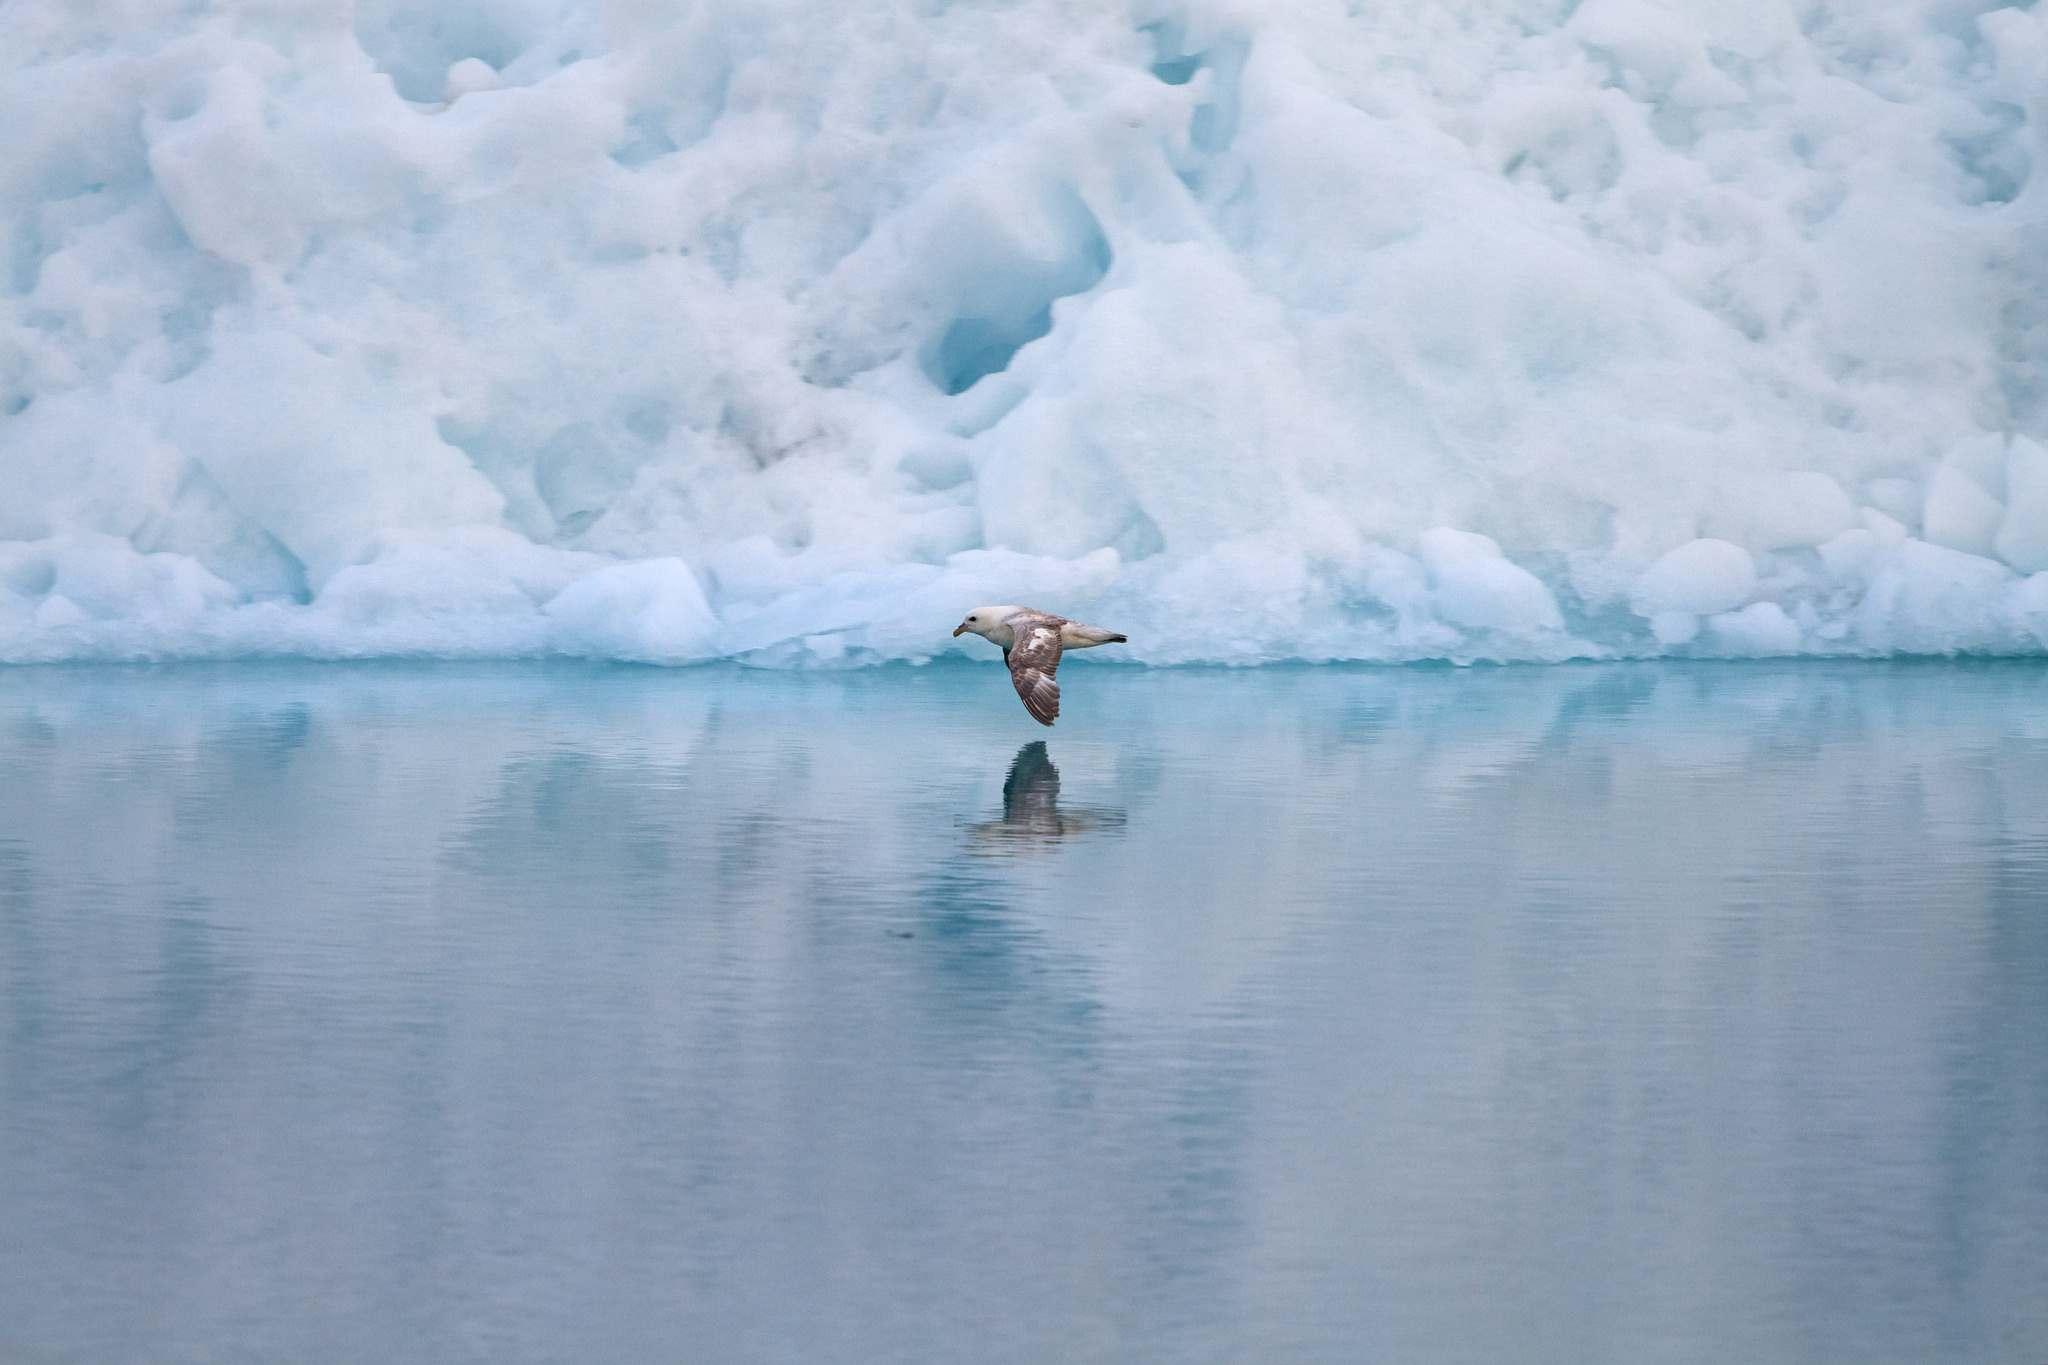 icefjord ilulissat8 The icefjord in Ilulissat, Greenland